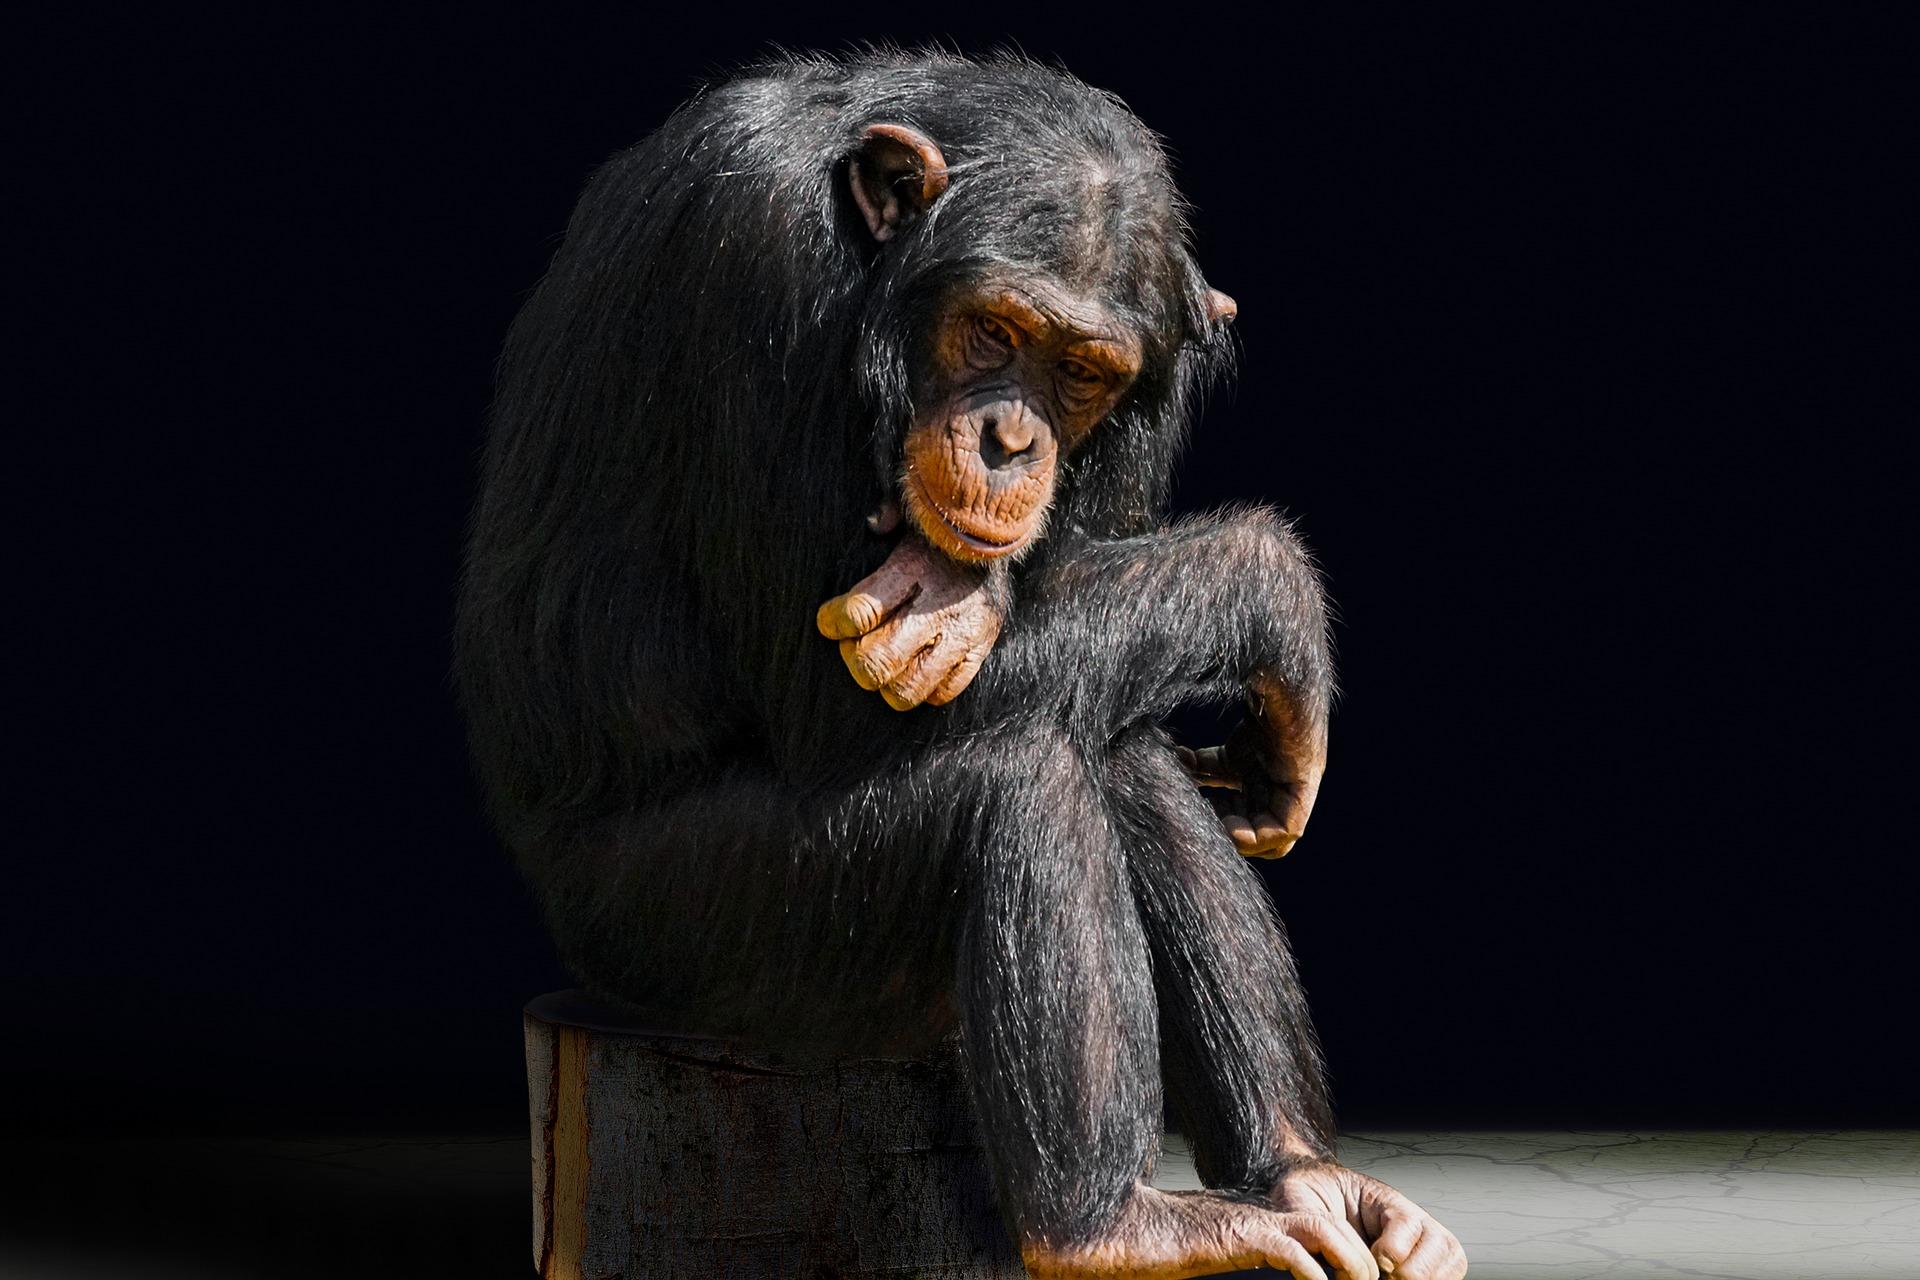 The Origins and Evolutionary Effects of Consciousness